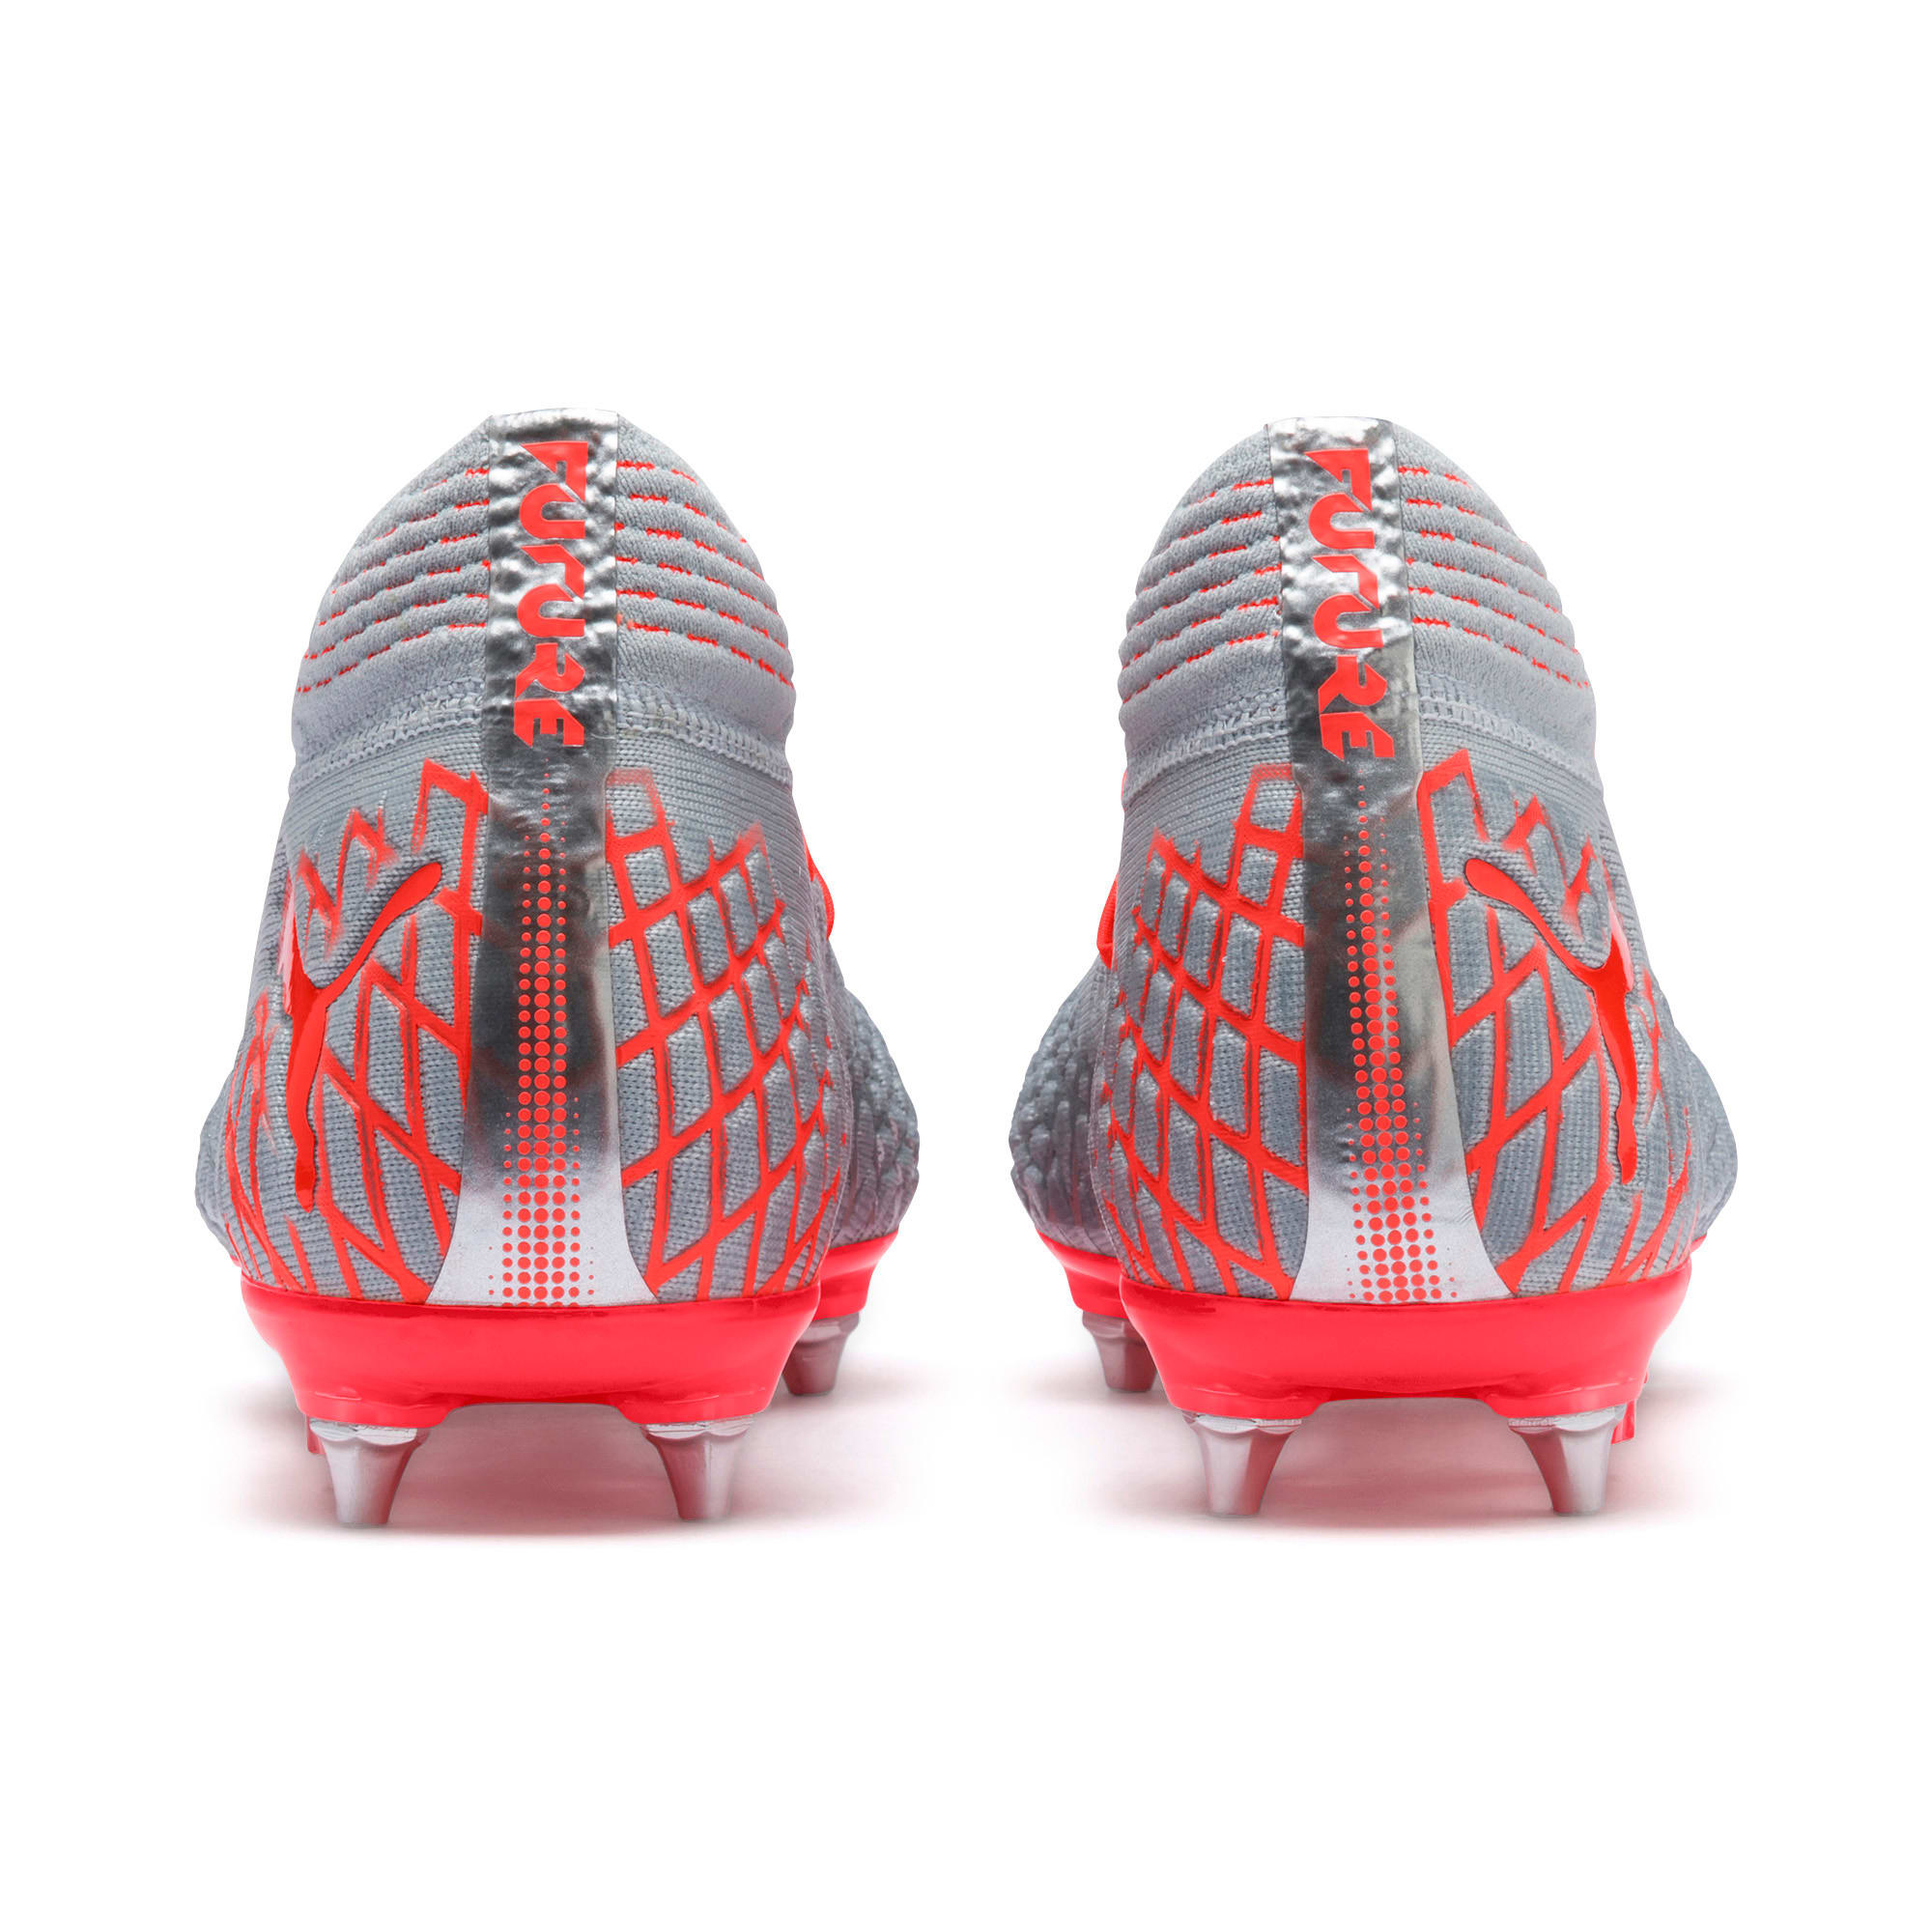 Thumbnail 4 of Scarpe da calcio FUTURE 4.1 NETFIT MxSG, Blue-Nrgy Red-High Risk Red, medium